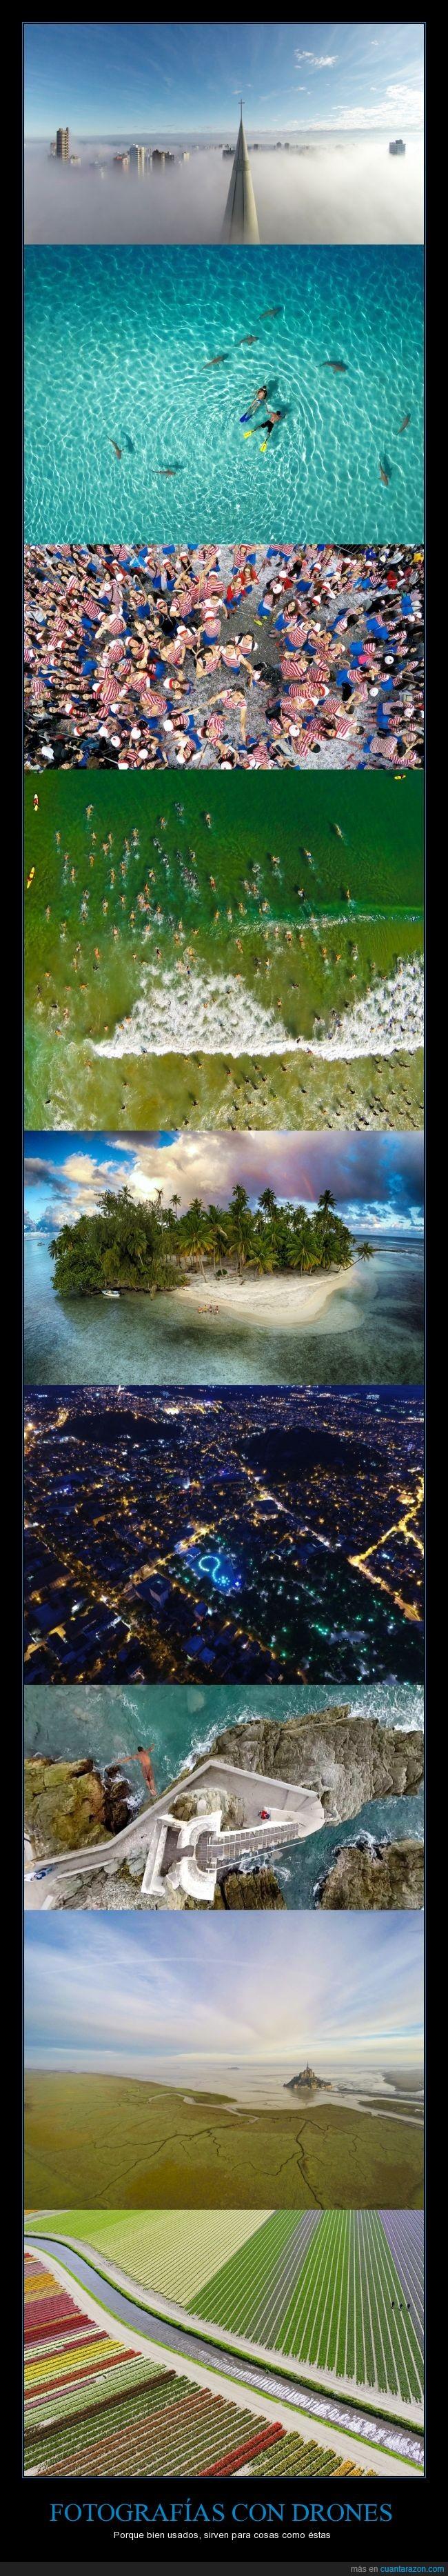 agua,aire,arriba,cielo,cosecha,dron,fotografia,mar,picado,plano,surf,tulipan,wally